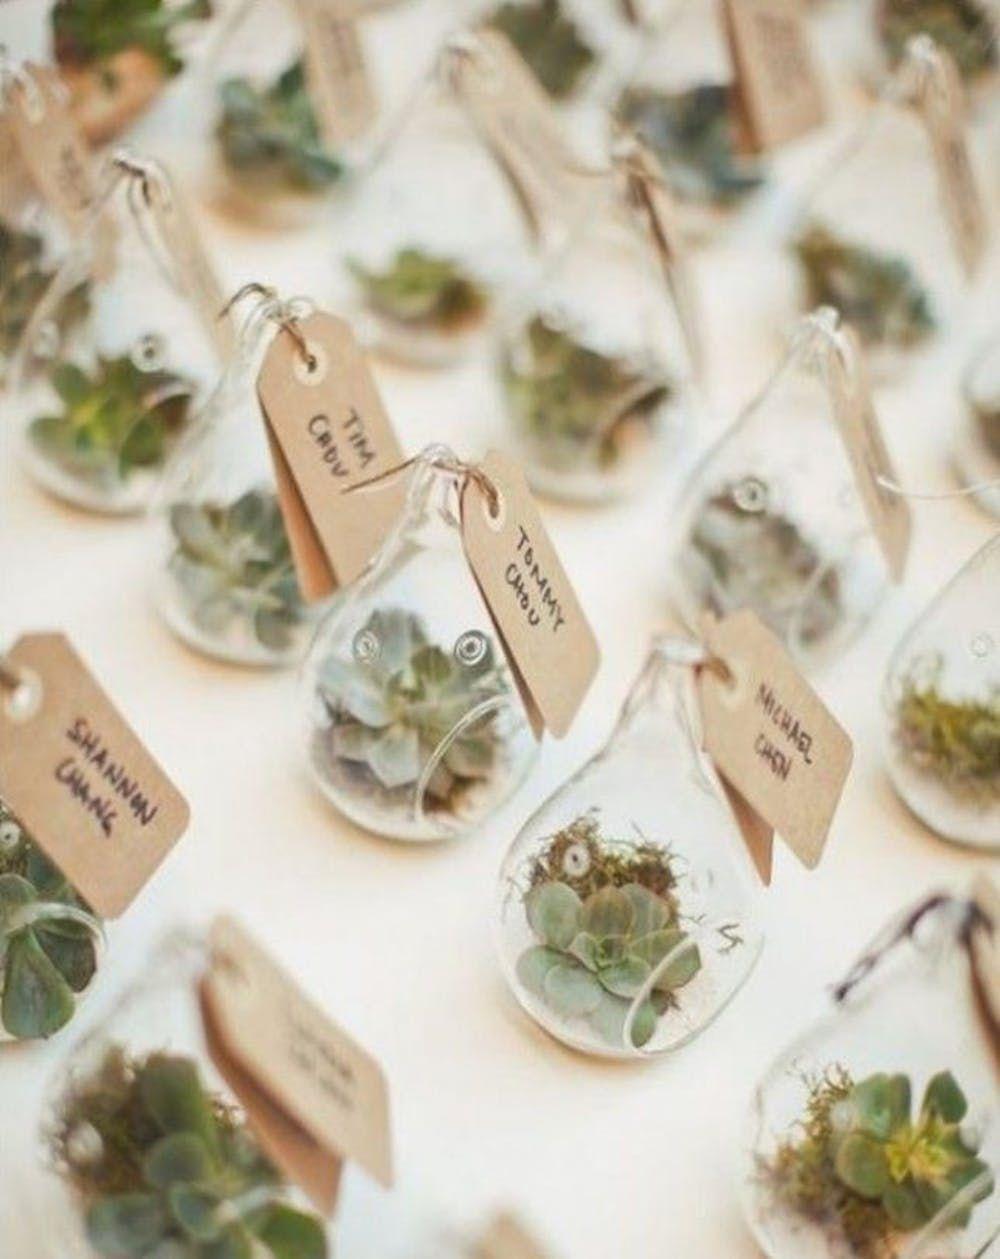 wedding favor plants weddingfavorsplants creativeweddinggiftsforguests